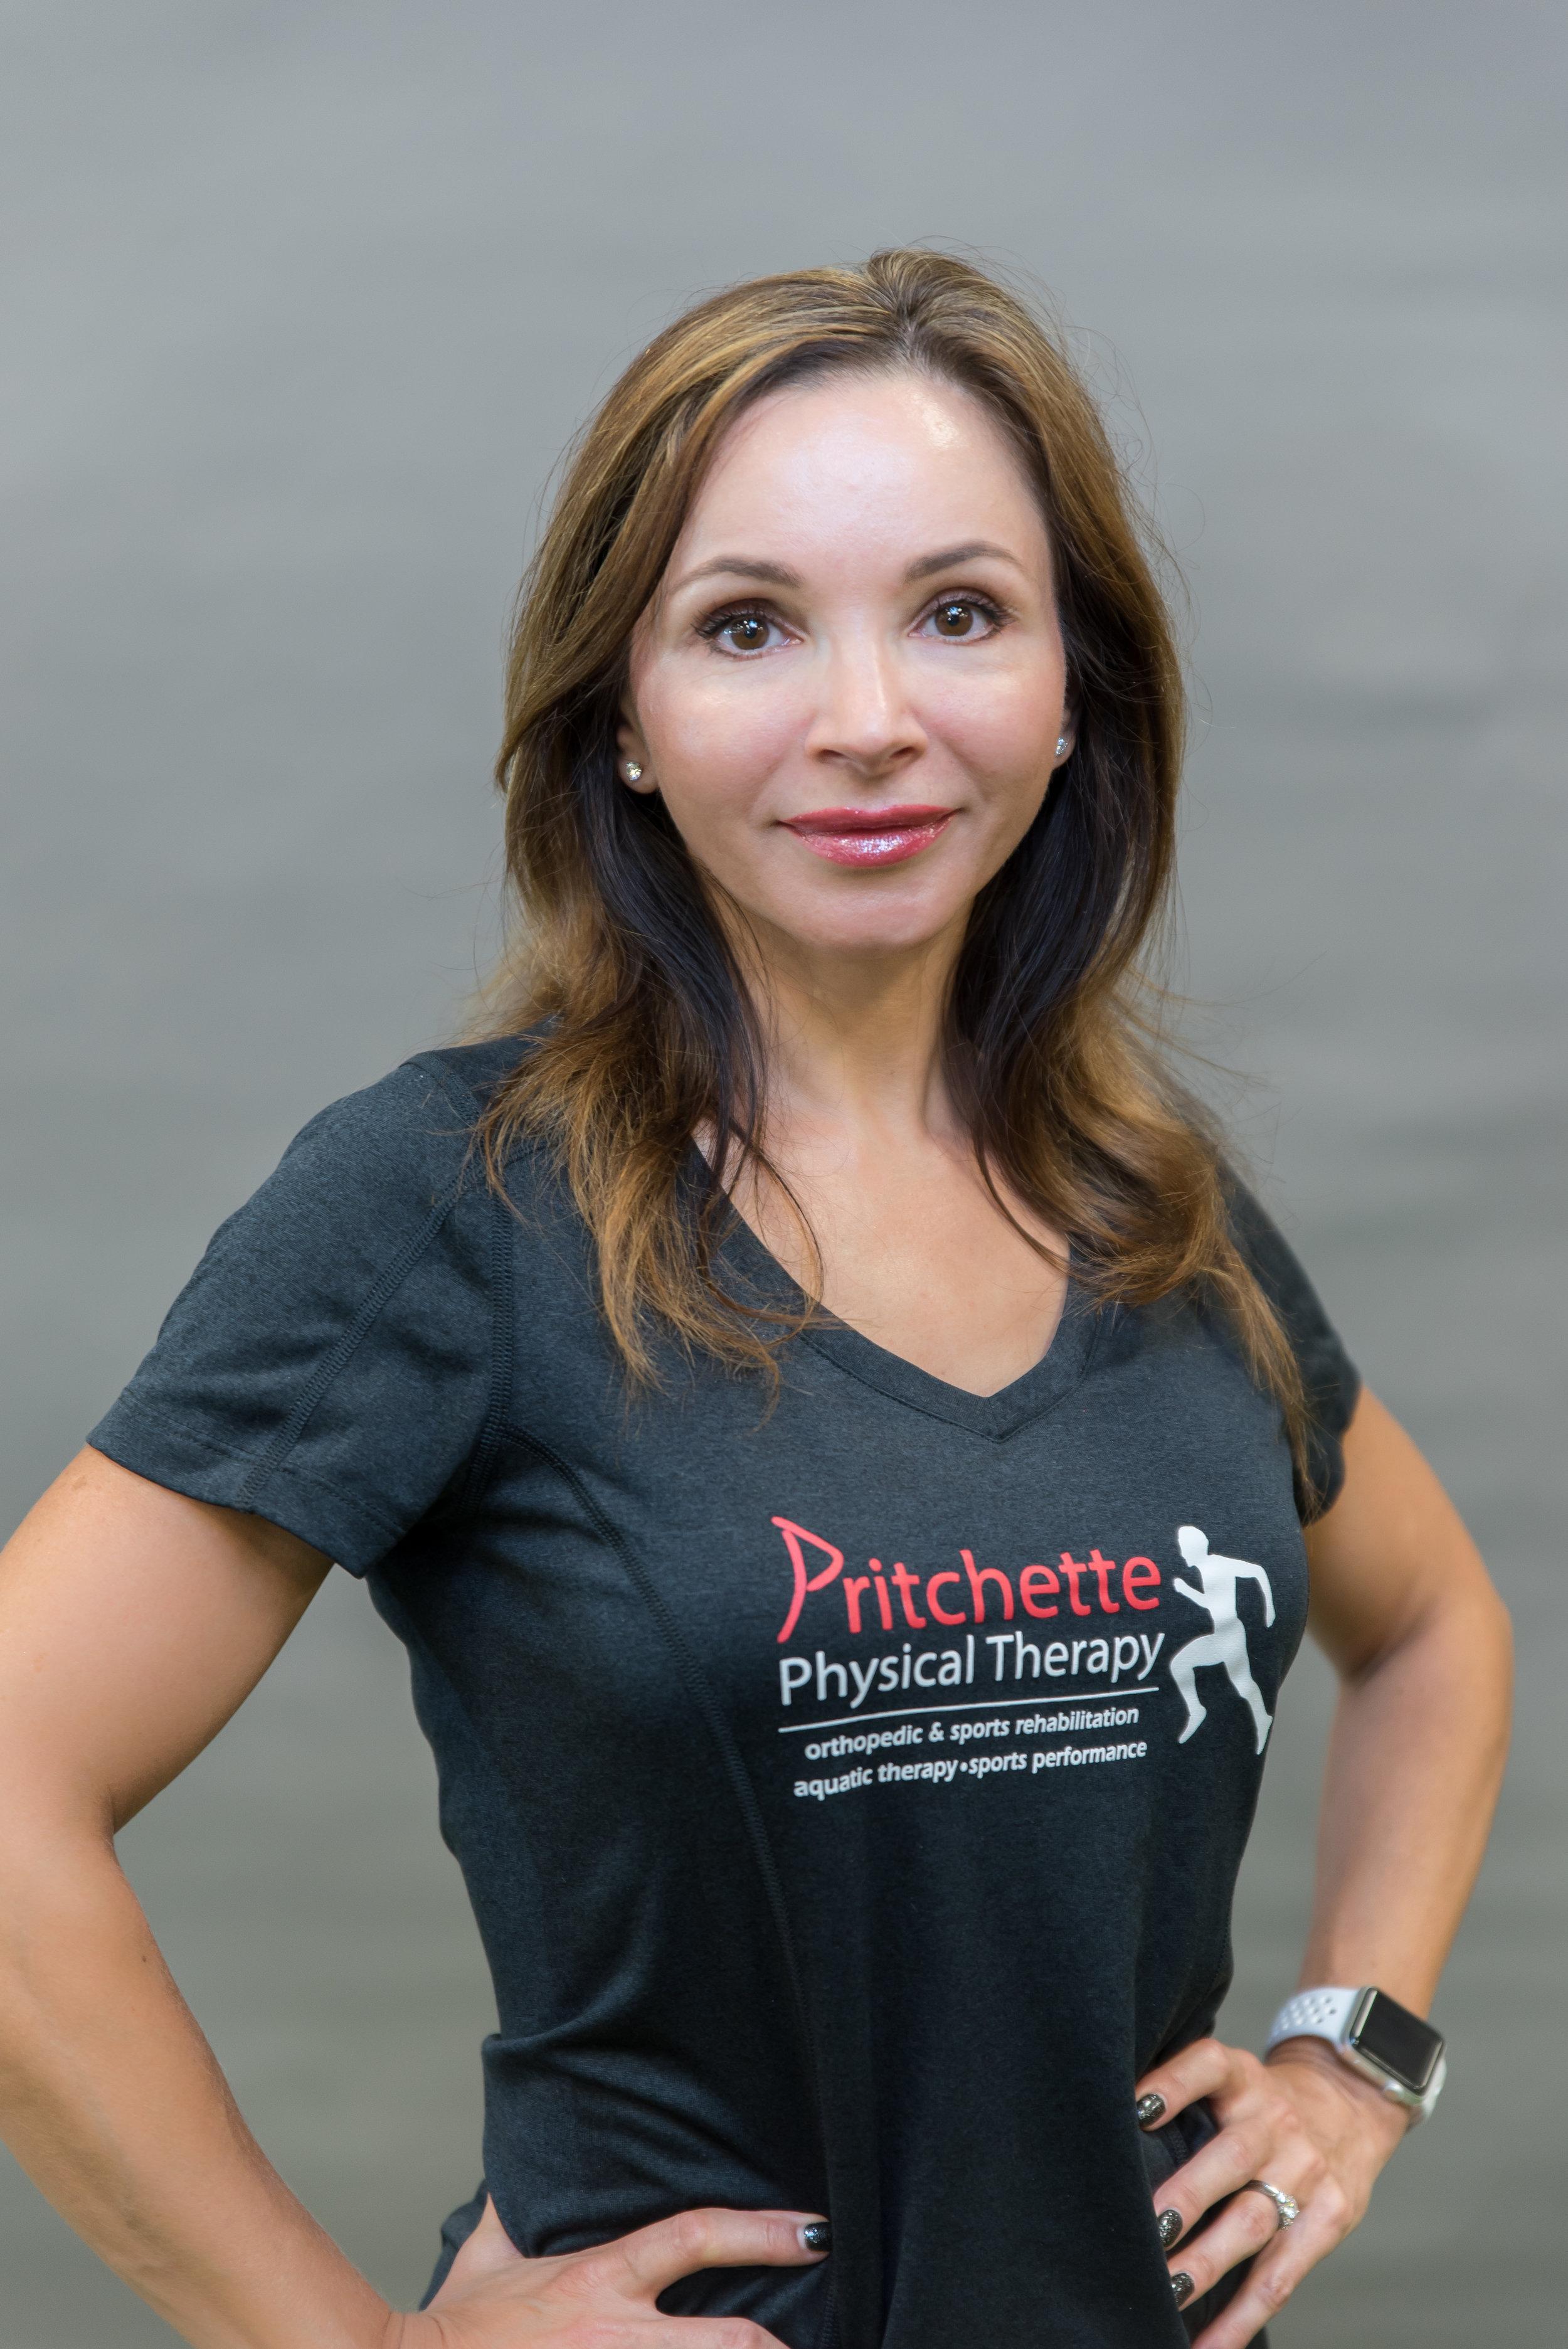 Elena Pritchette